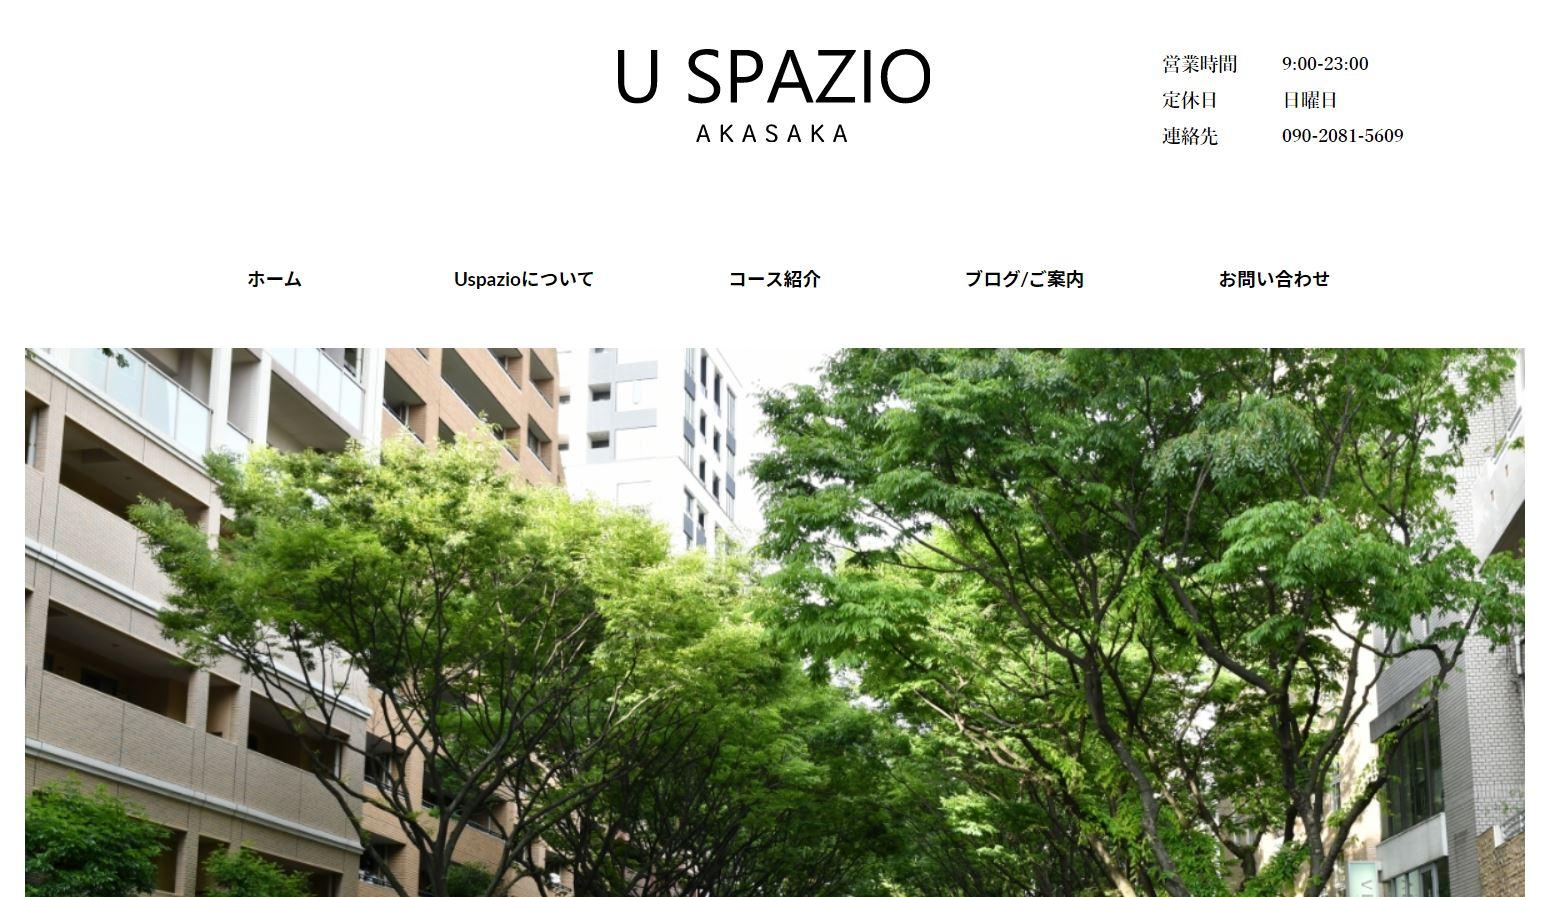 U spazio (ユウスパッツィオ) 福岡